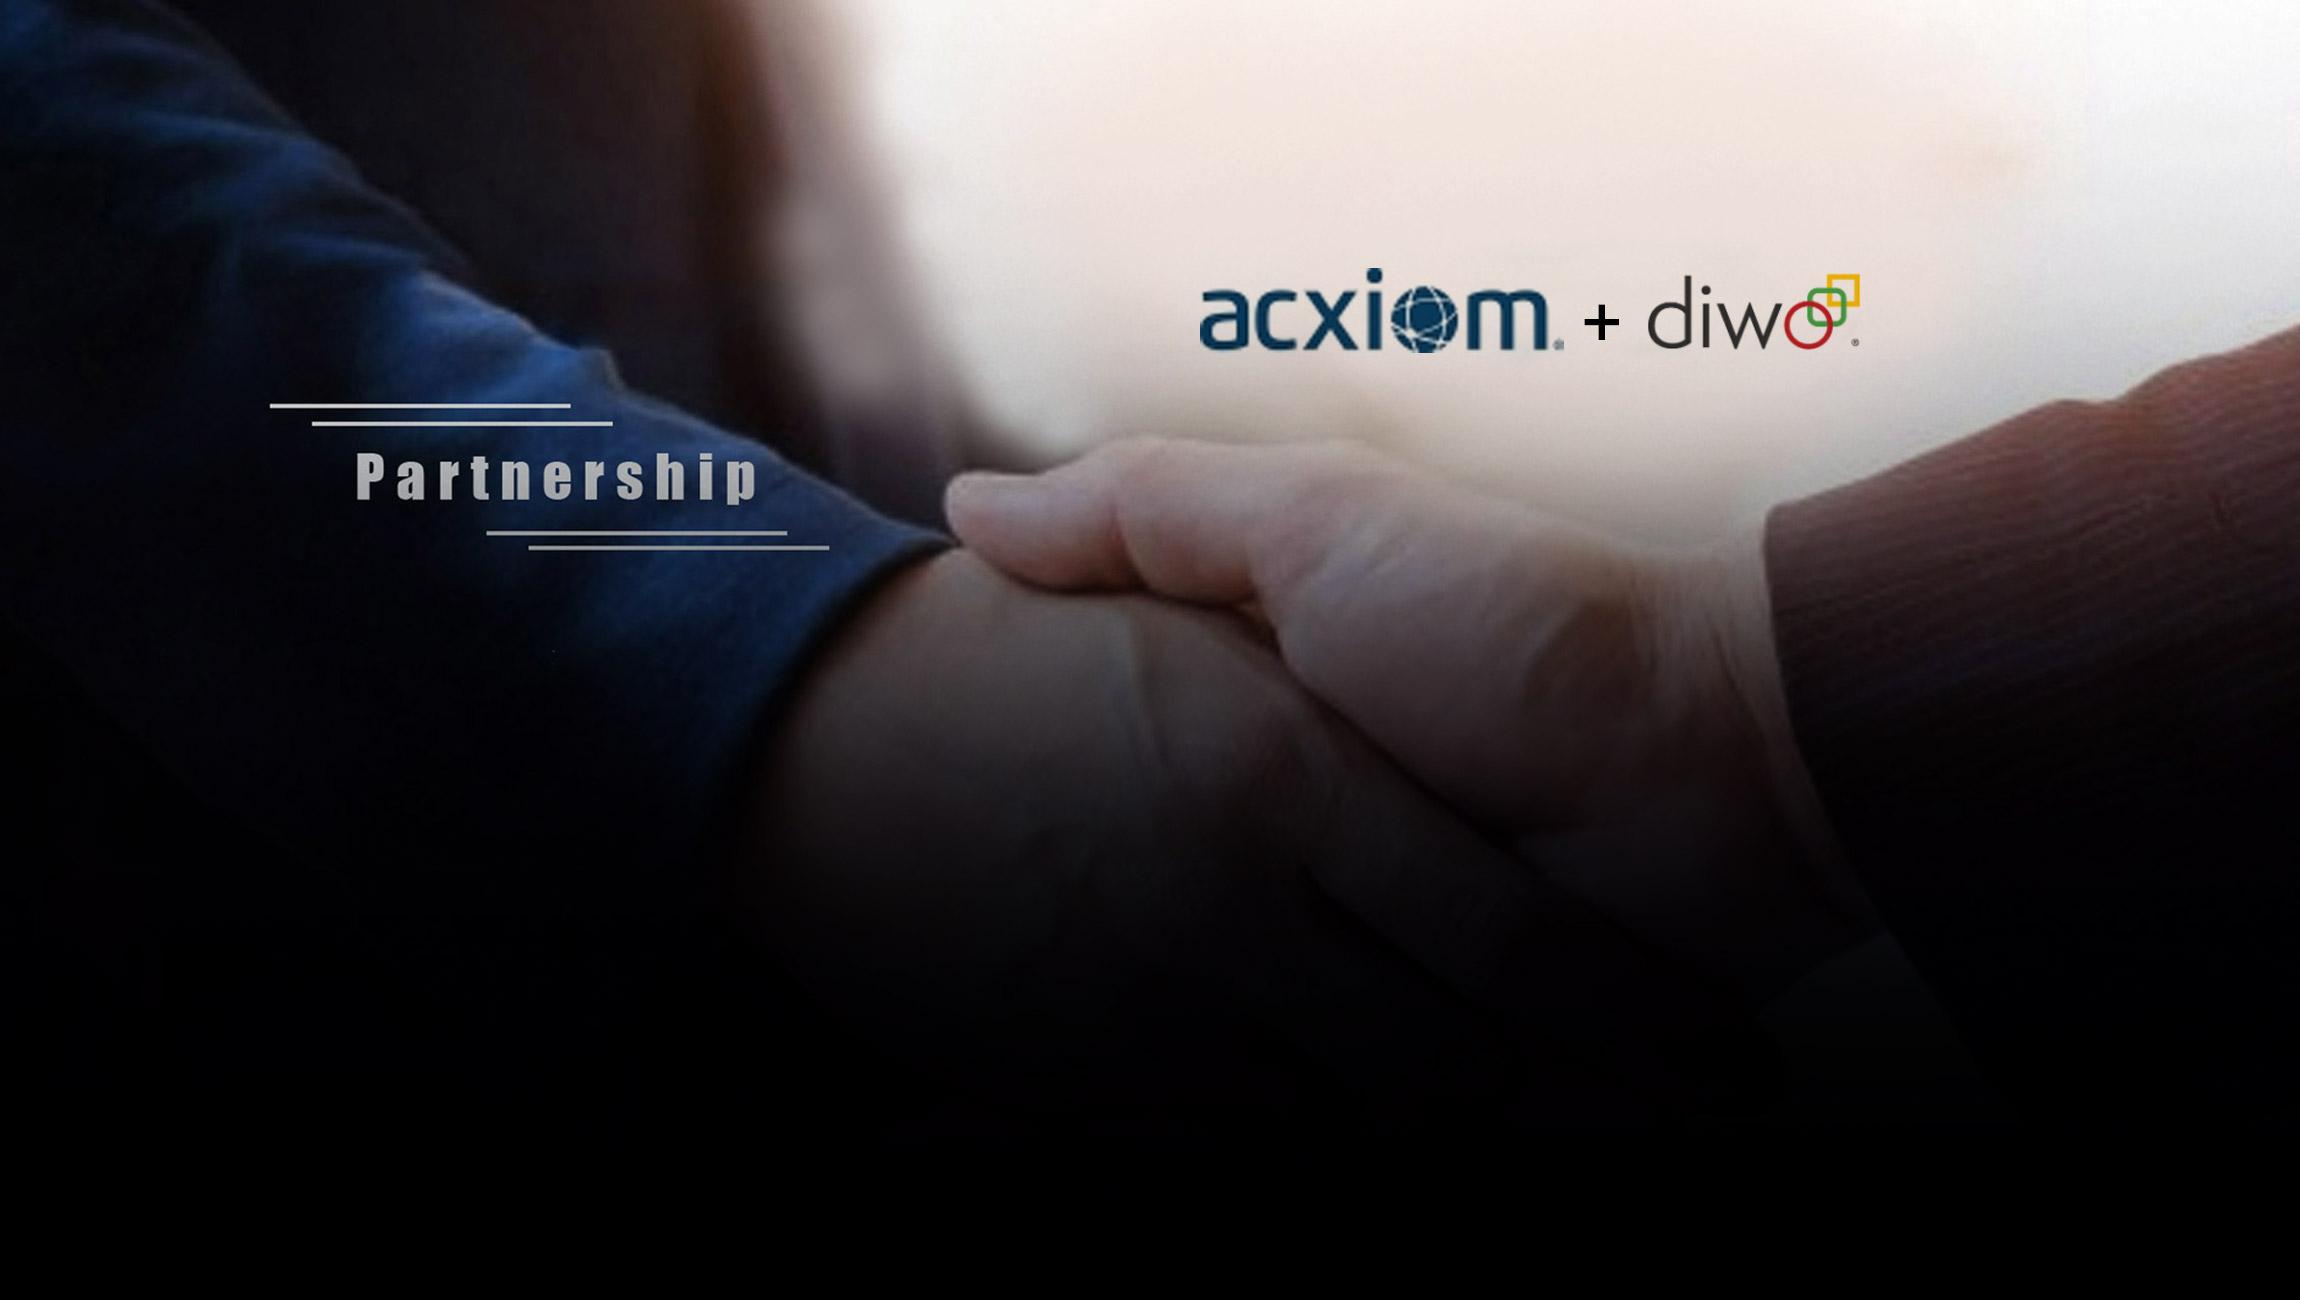 Acxiom-_-diwo-Partnership-Goes-Beyond-Marketing_-Delivers-Business-Optimization-Solutions